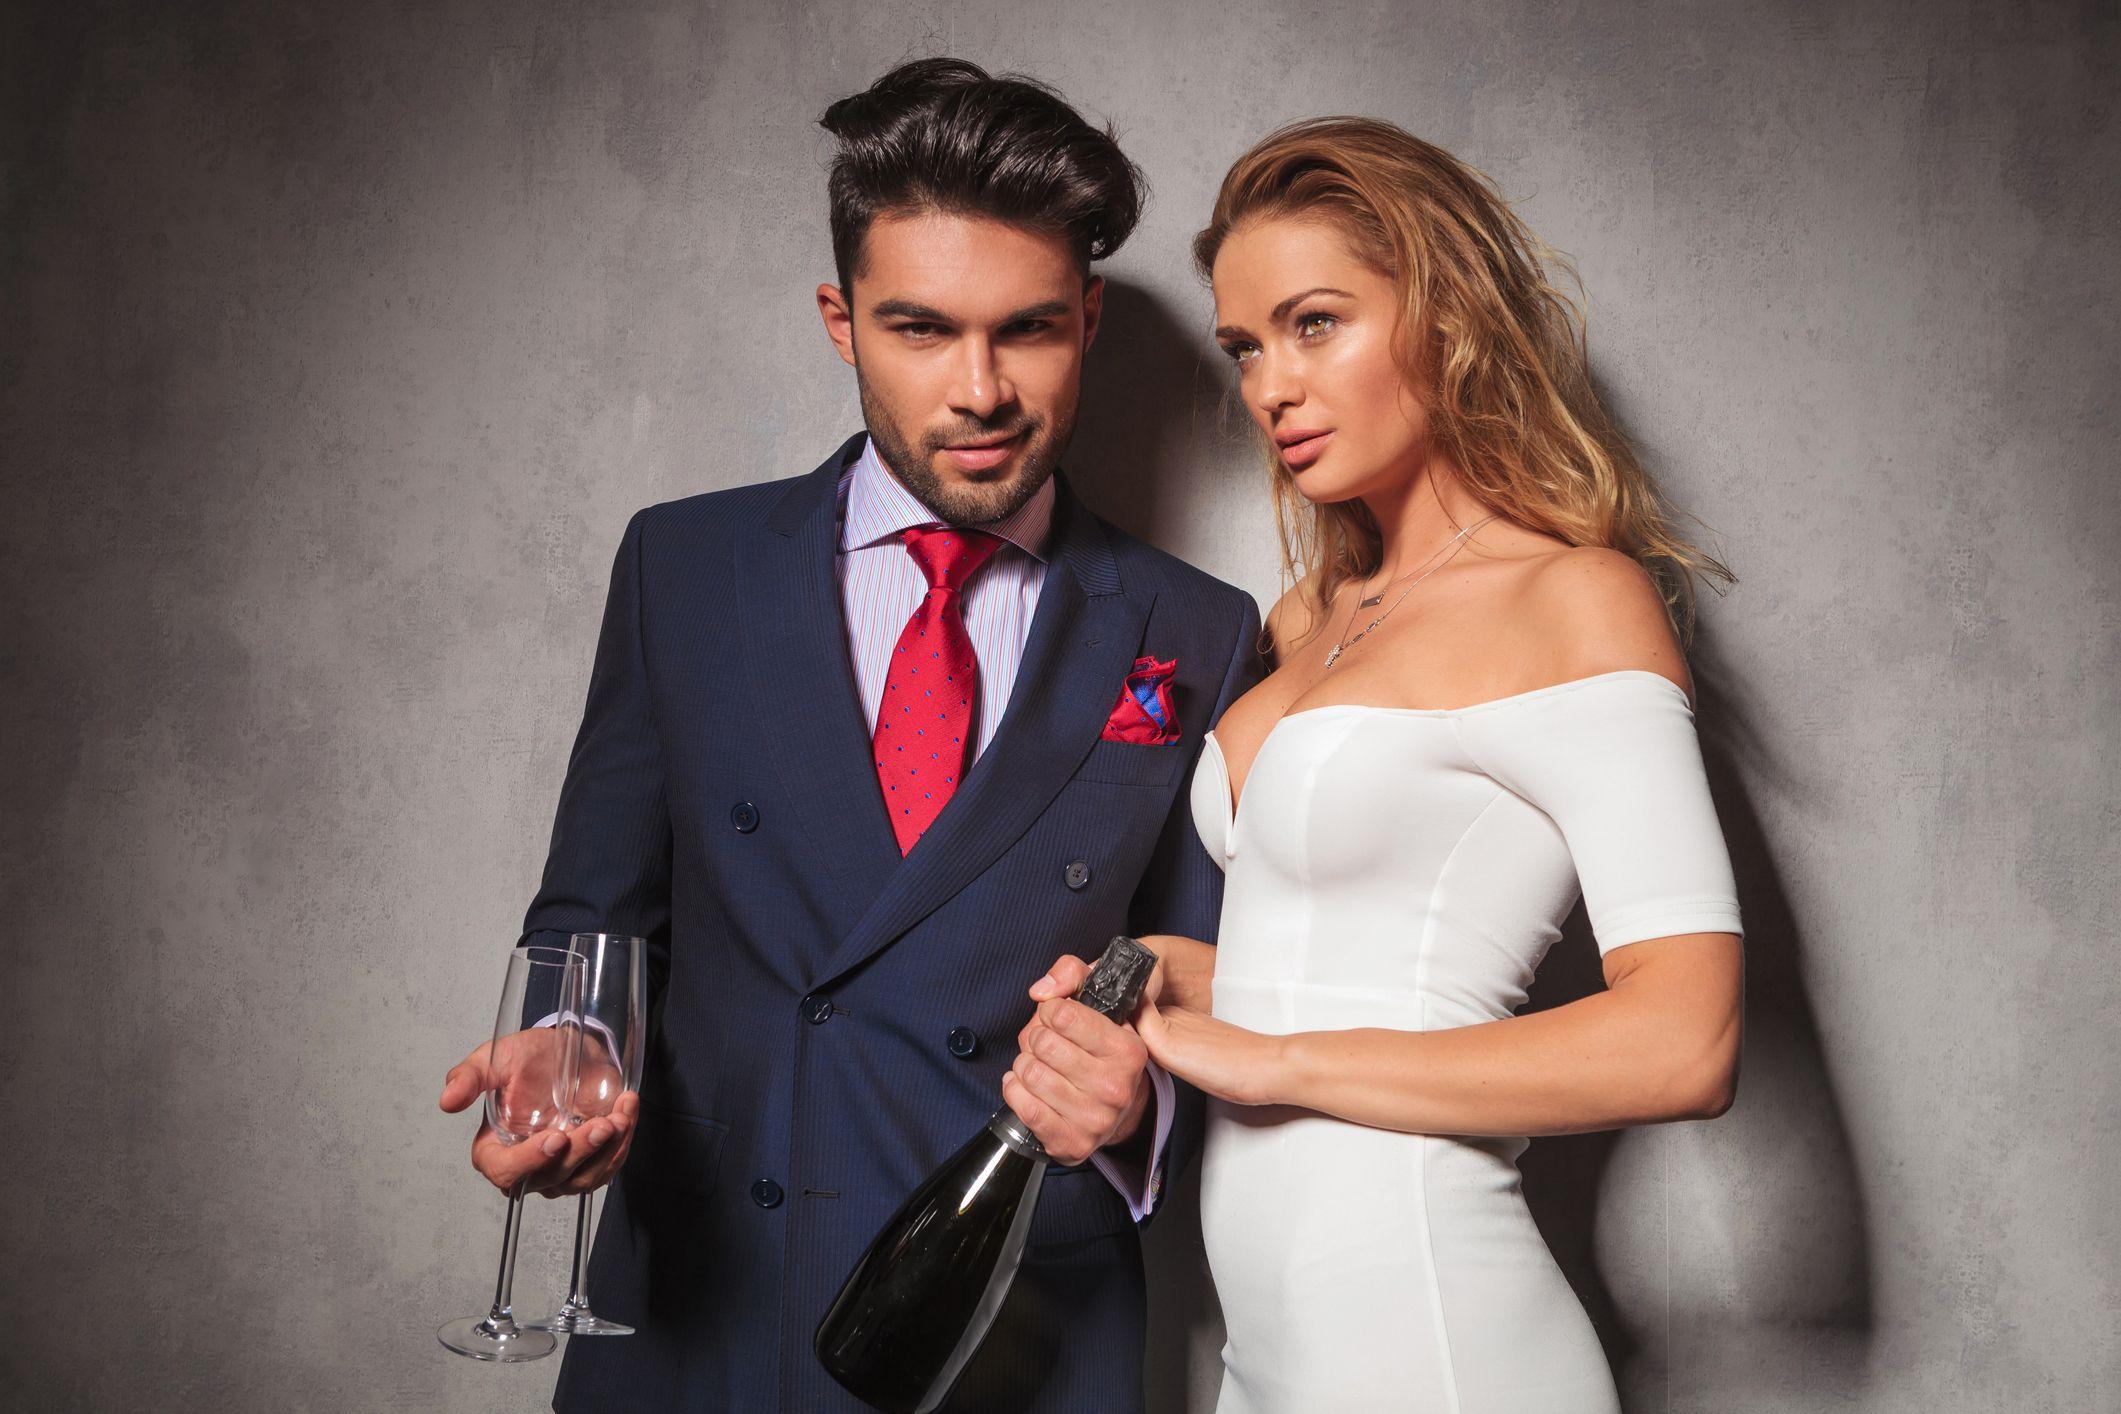 millennials-rich-champagne-stock